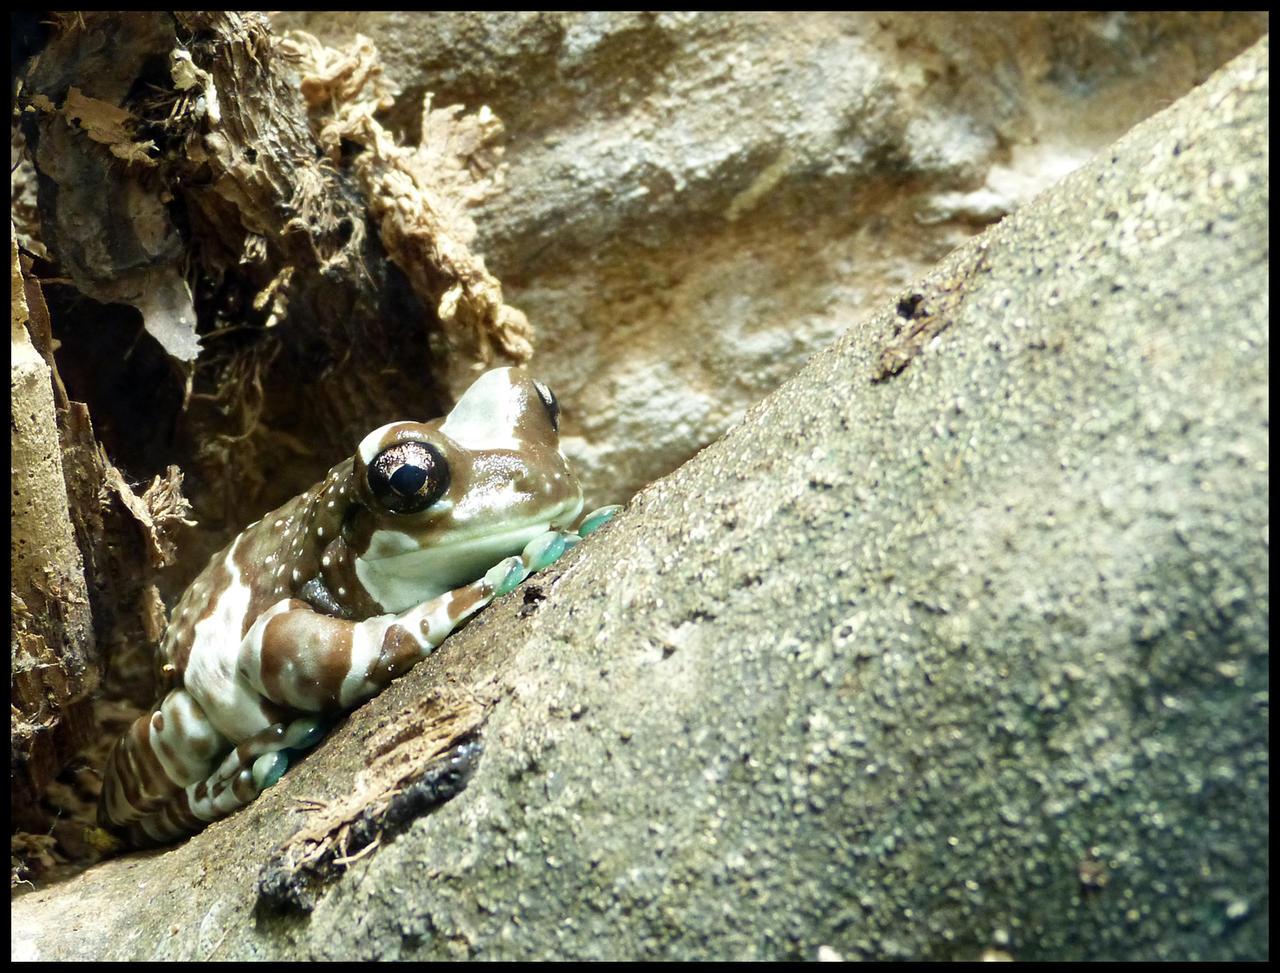 Mission golden-eyed tree frog by Seridon on DeviantArt